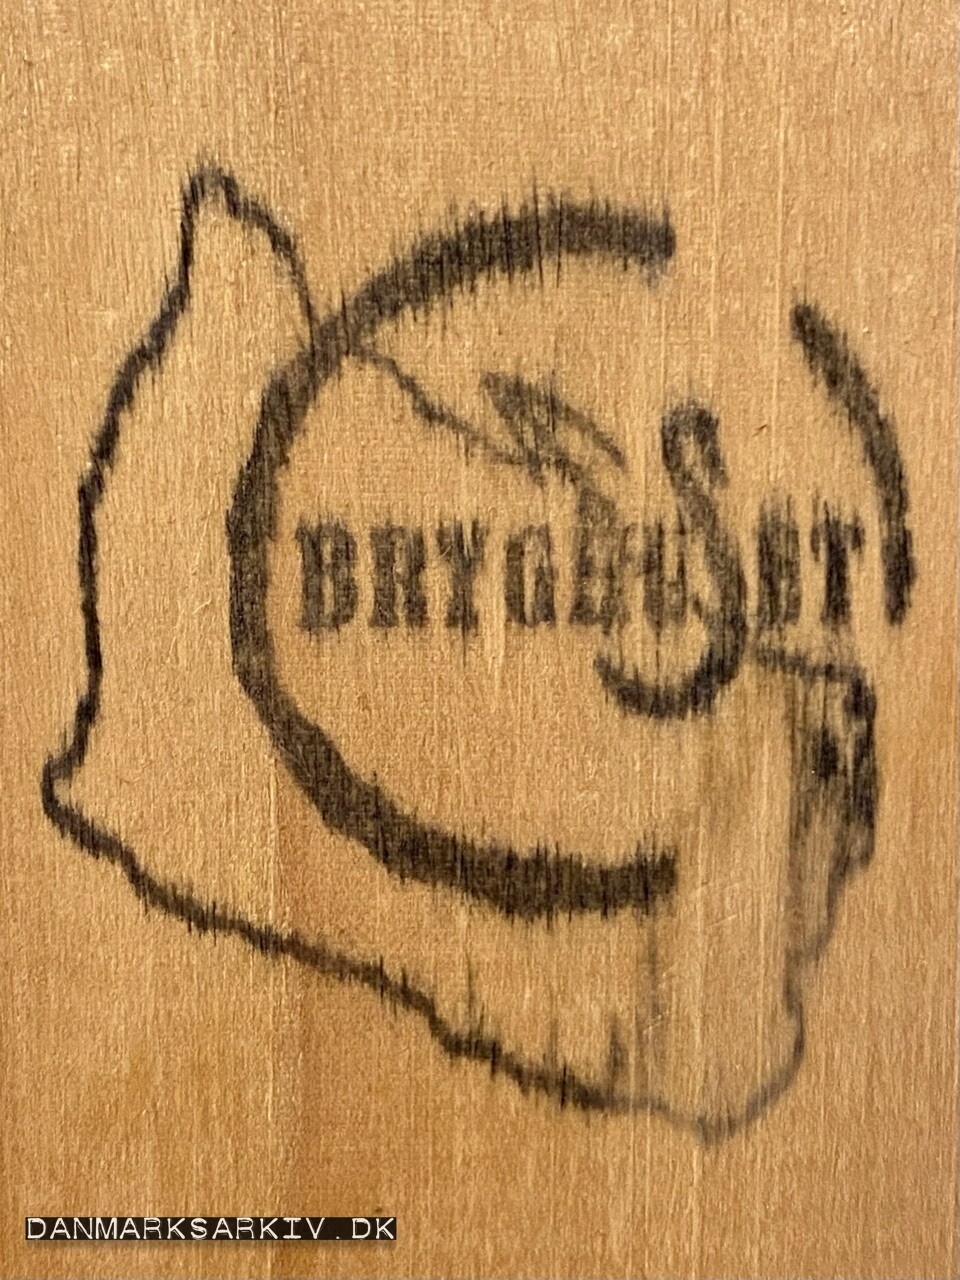 Svaneke Bryghus